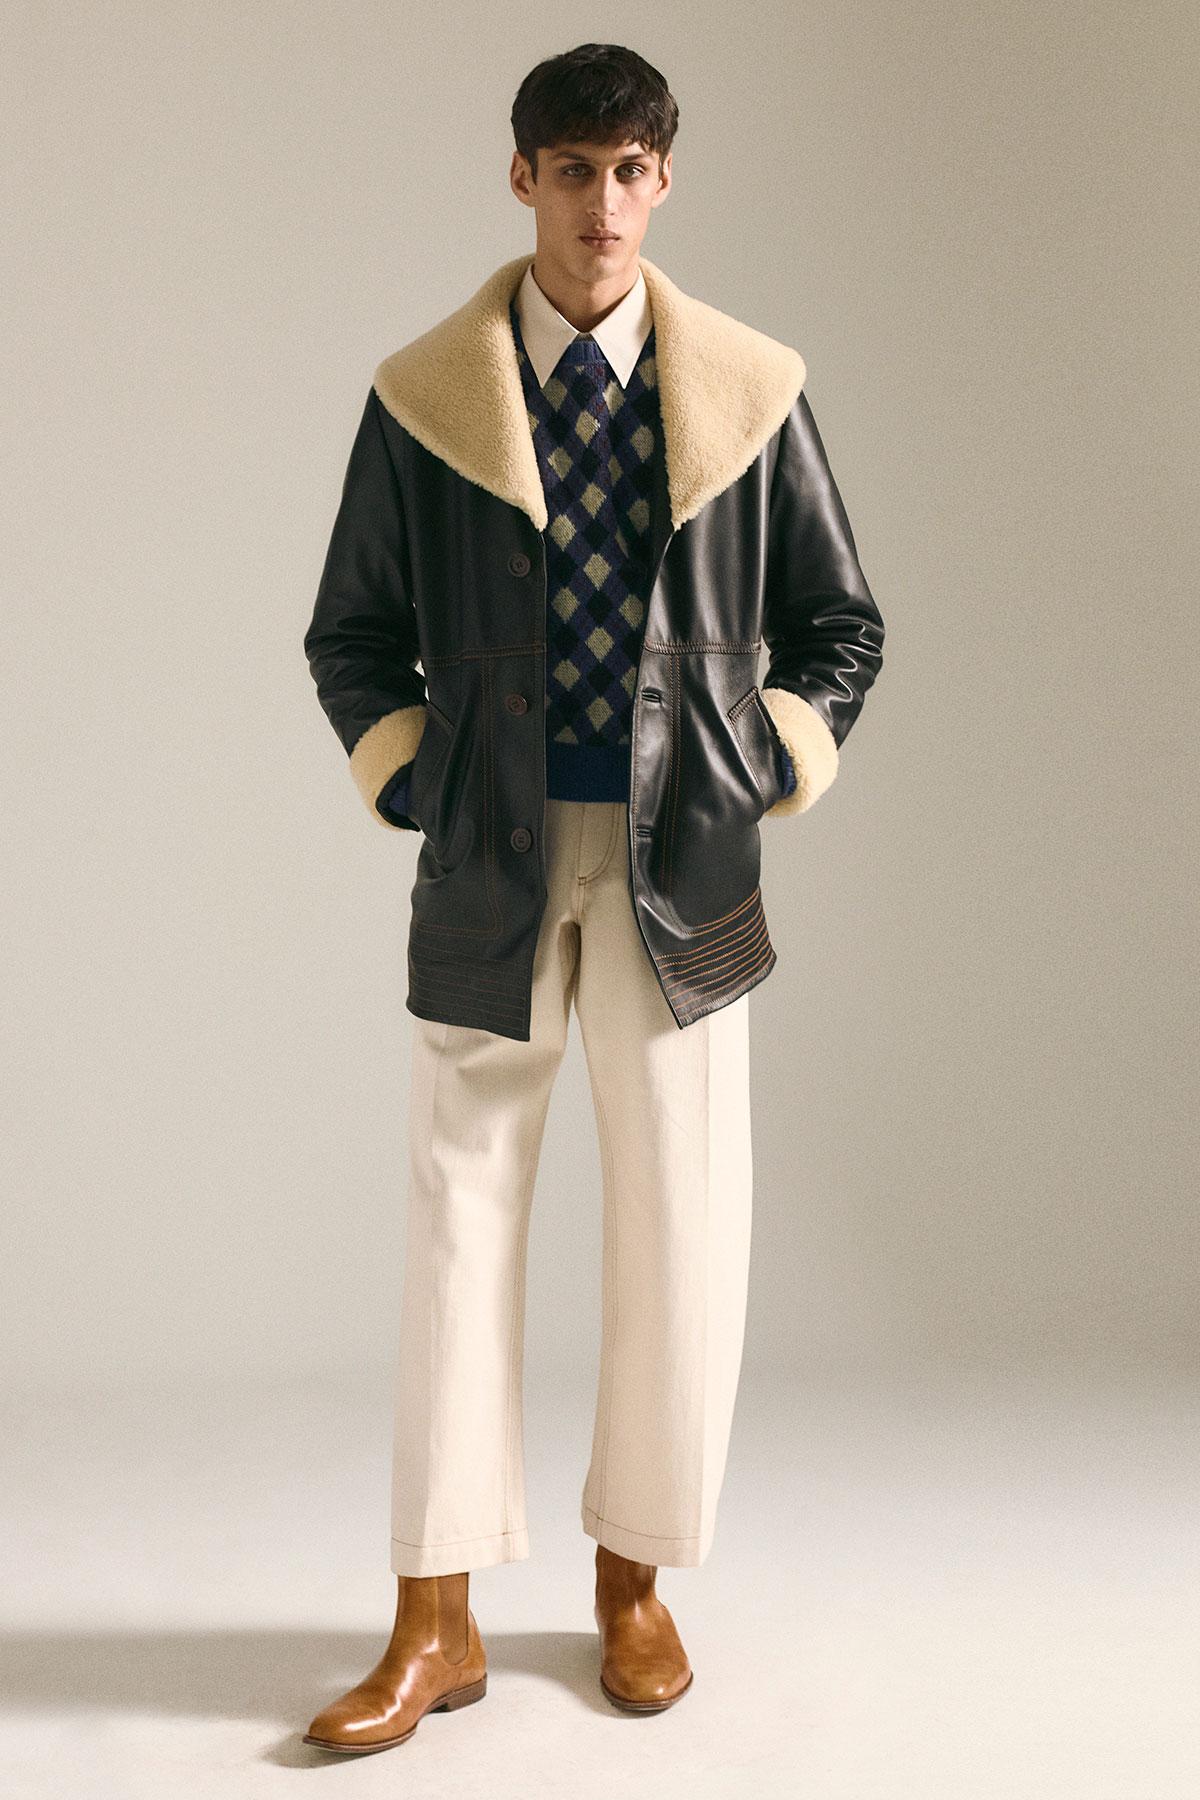 wales-bonner-autumn-winter-2021-fashionography